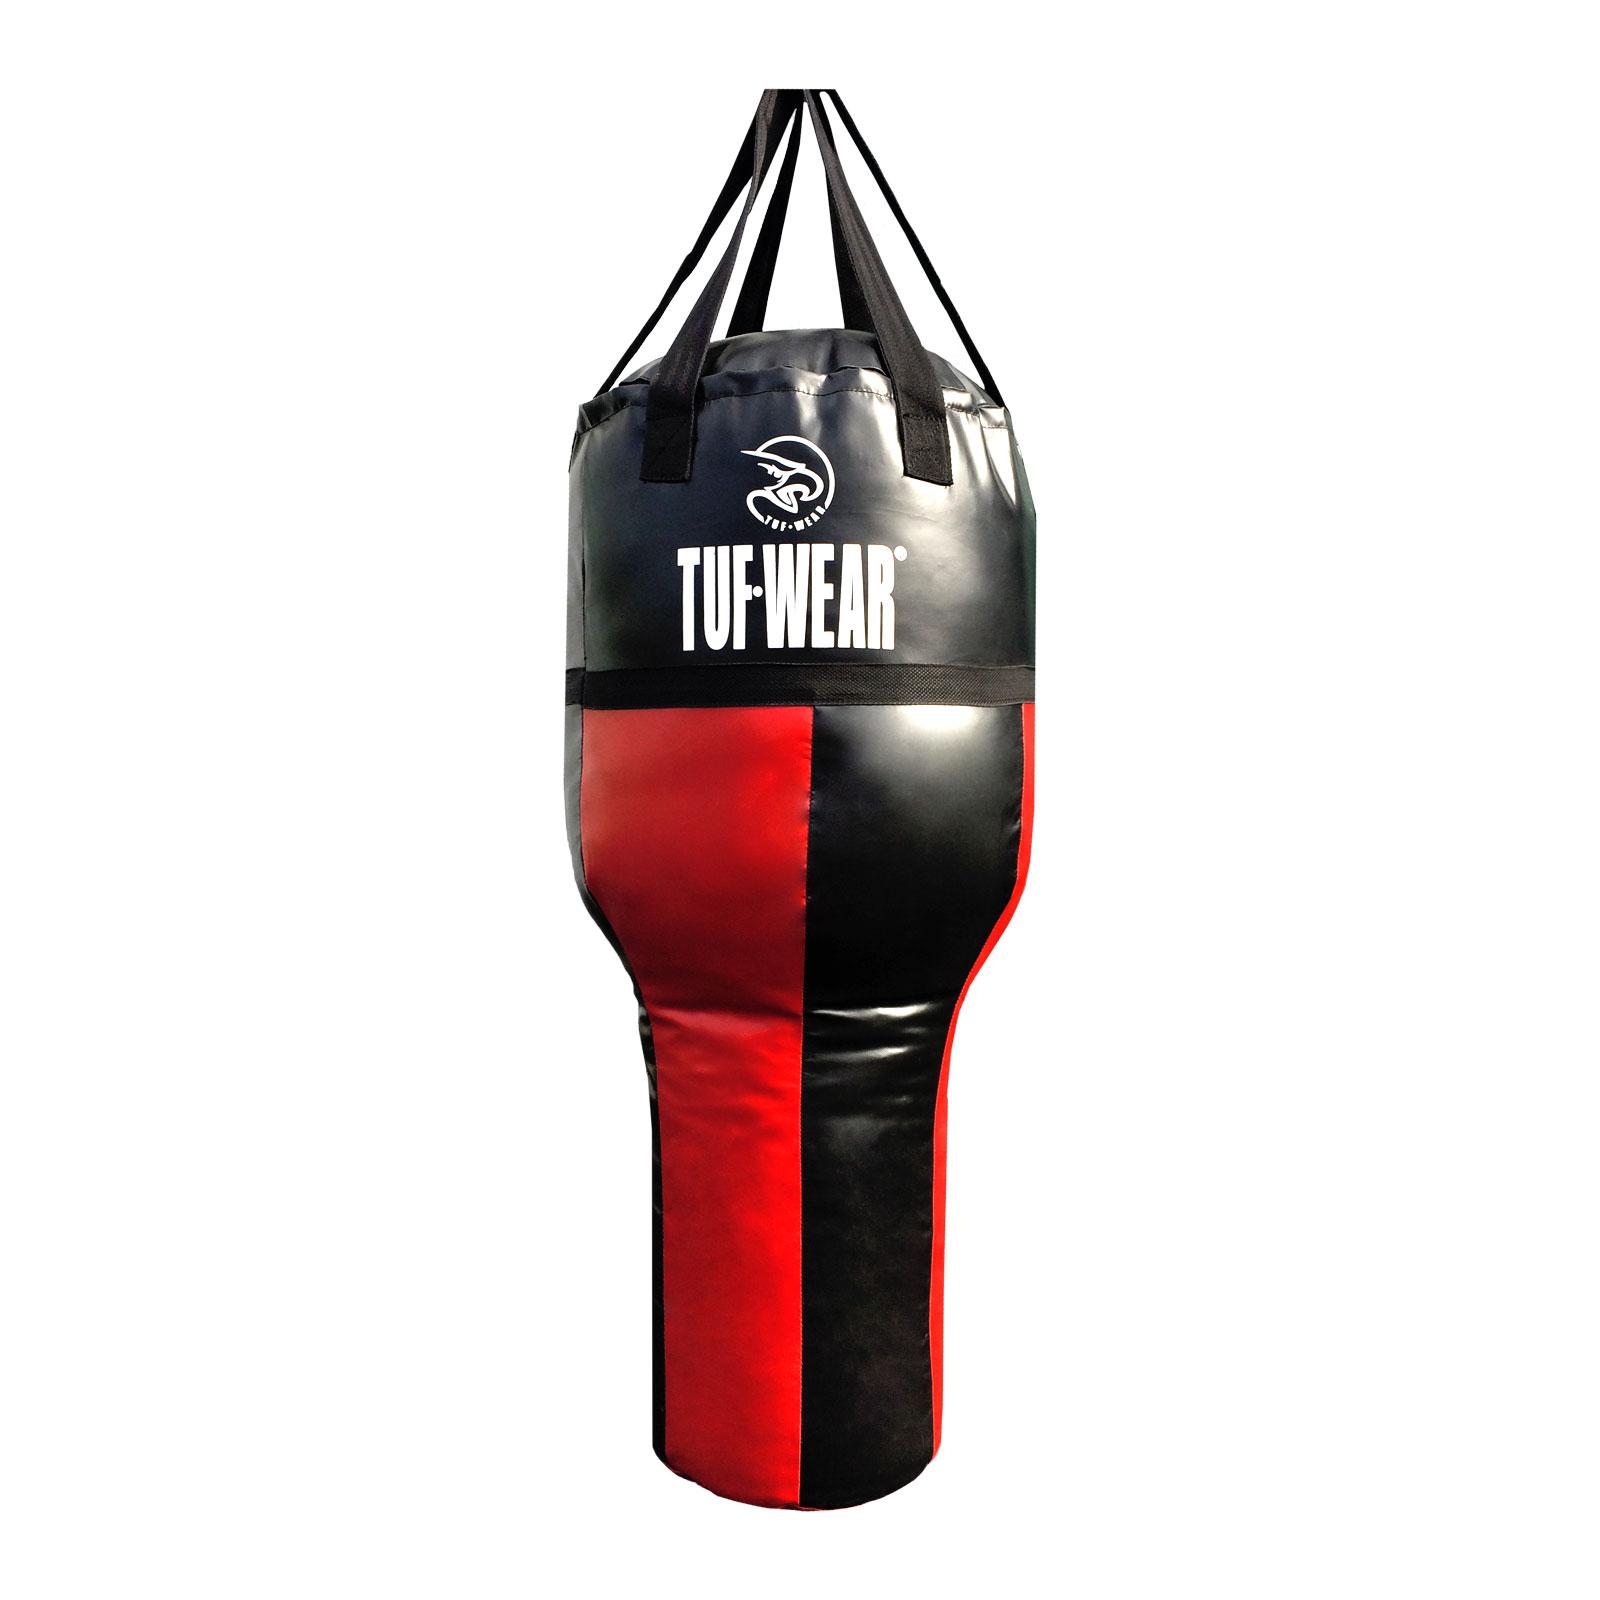 Tuf Wear Boxing Punch Bag PU Angle Punchbag